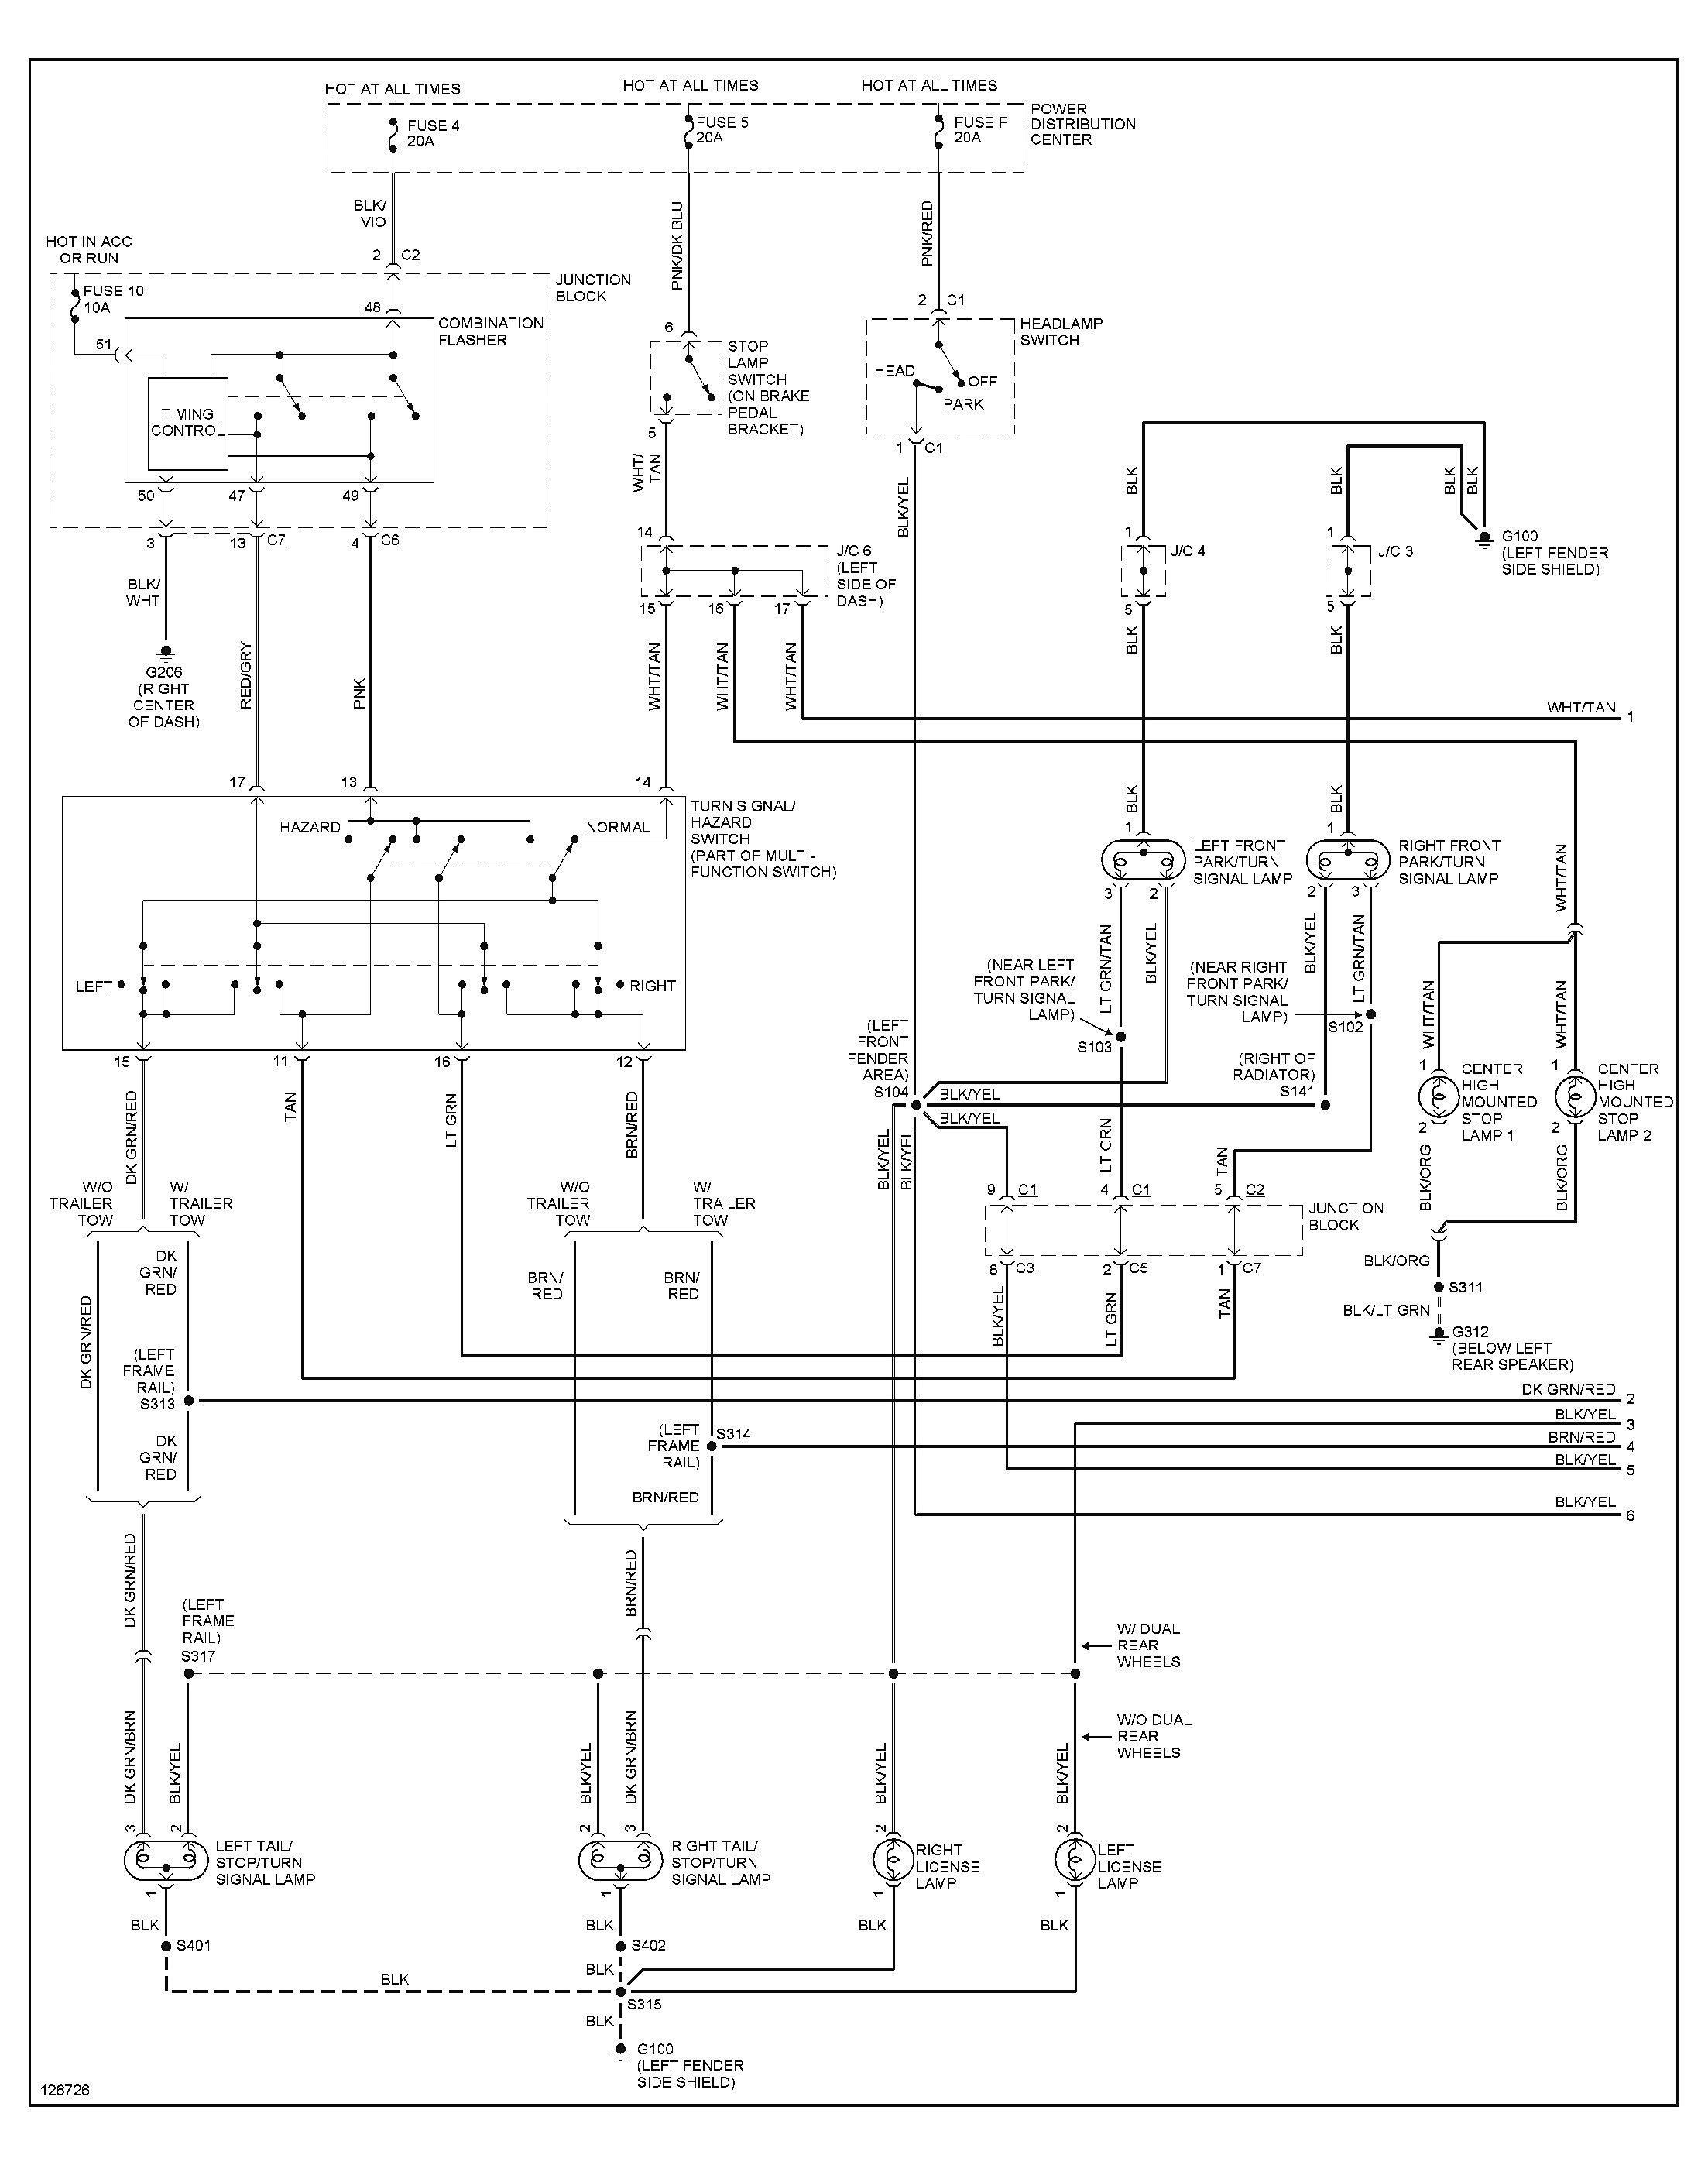 Dodge Flat Fender Power Wagon Parts : dodge, fender, power, wagon, parts, Dodge, Flatbed, Wiring, Diagram, Filter, Rich-suggest, Rich-suggest.cosmoristrutturazioni.it